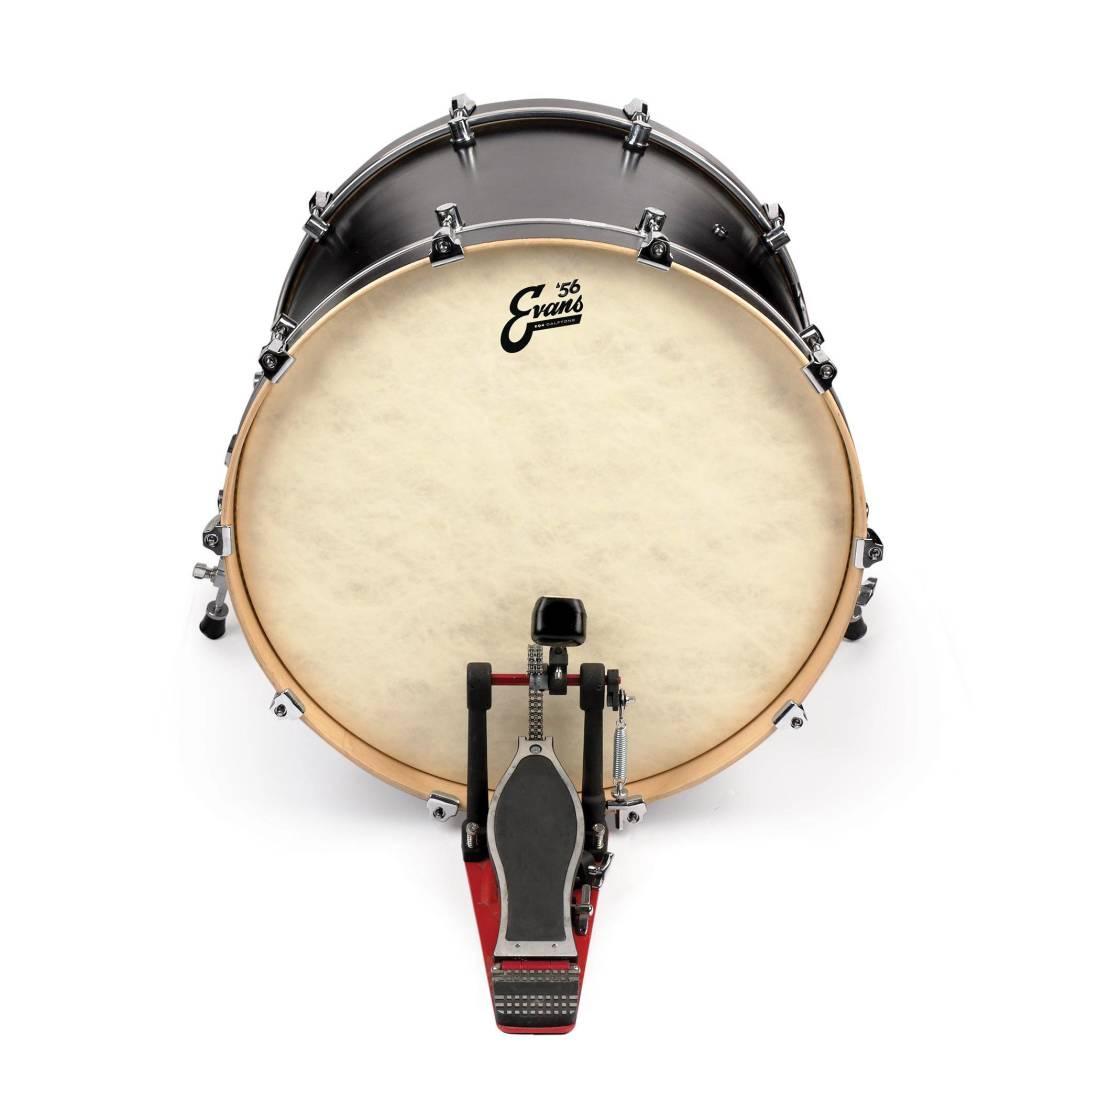 evans eq4 calftone bass drum head 18 inch long mcquade musical instruments. Black Bedroom Furniture Sets. Home Design Ideas